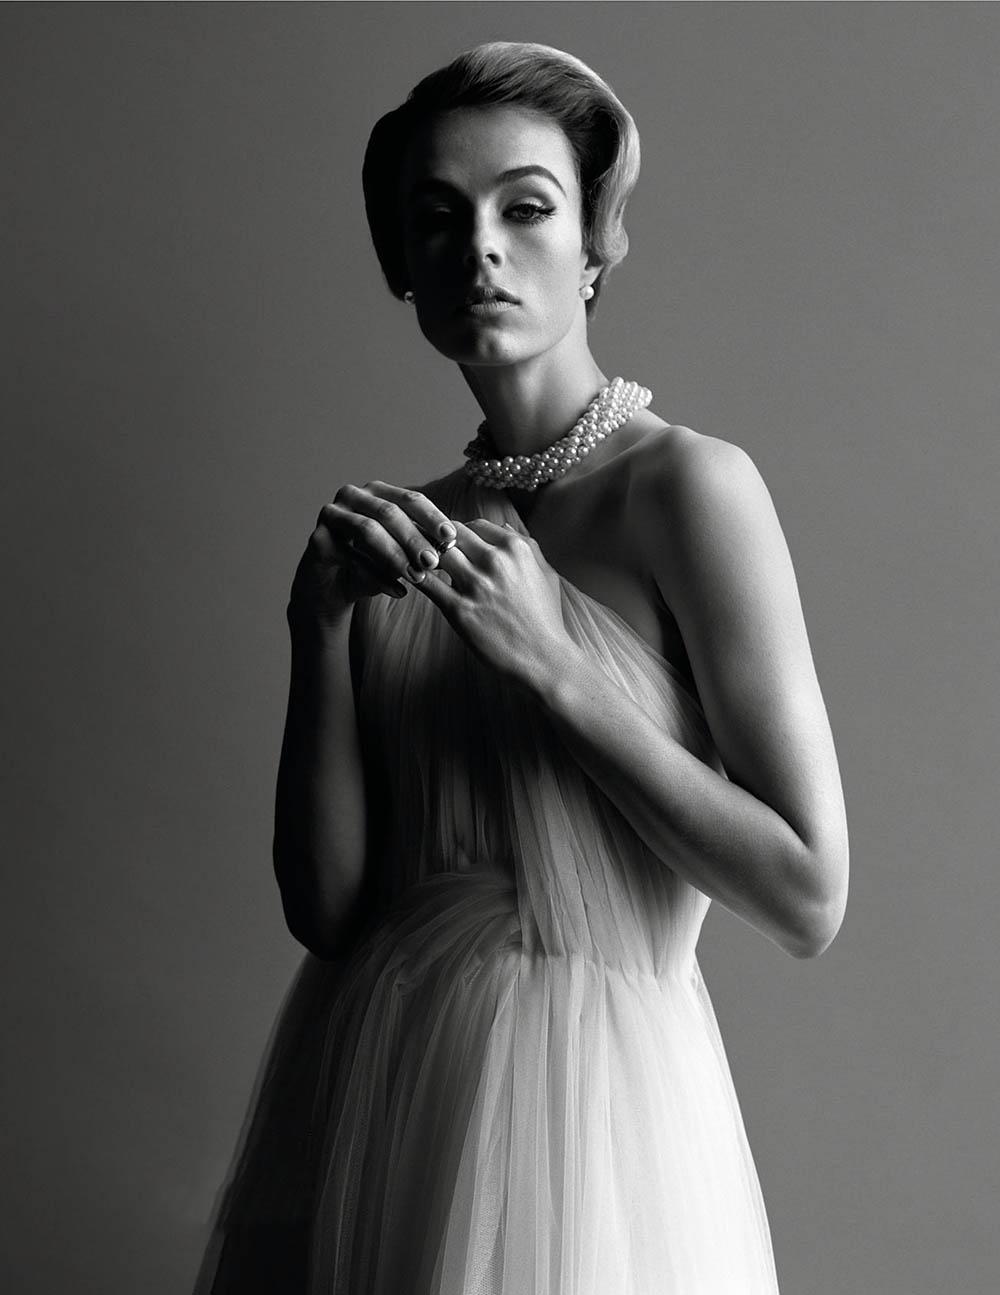 Edie Campbell by Alasdair McLellan for Vogue Paris December 2019 January 2020